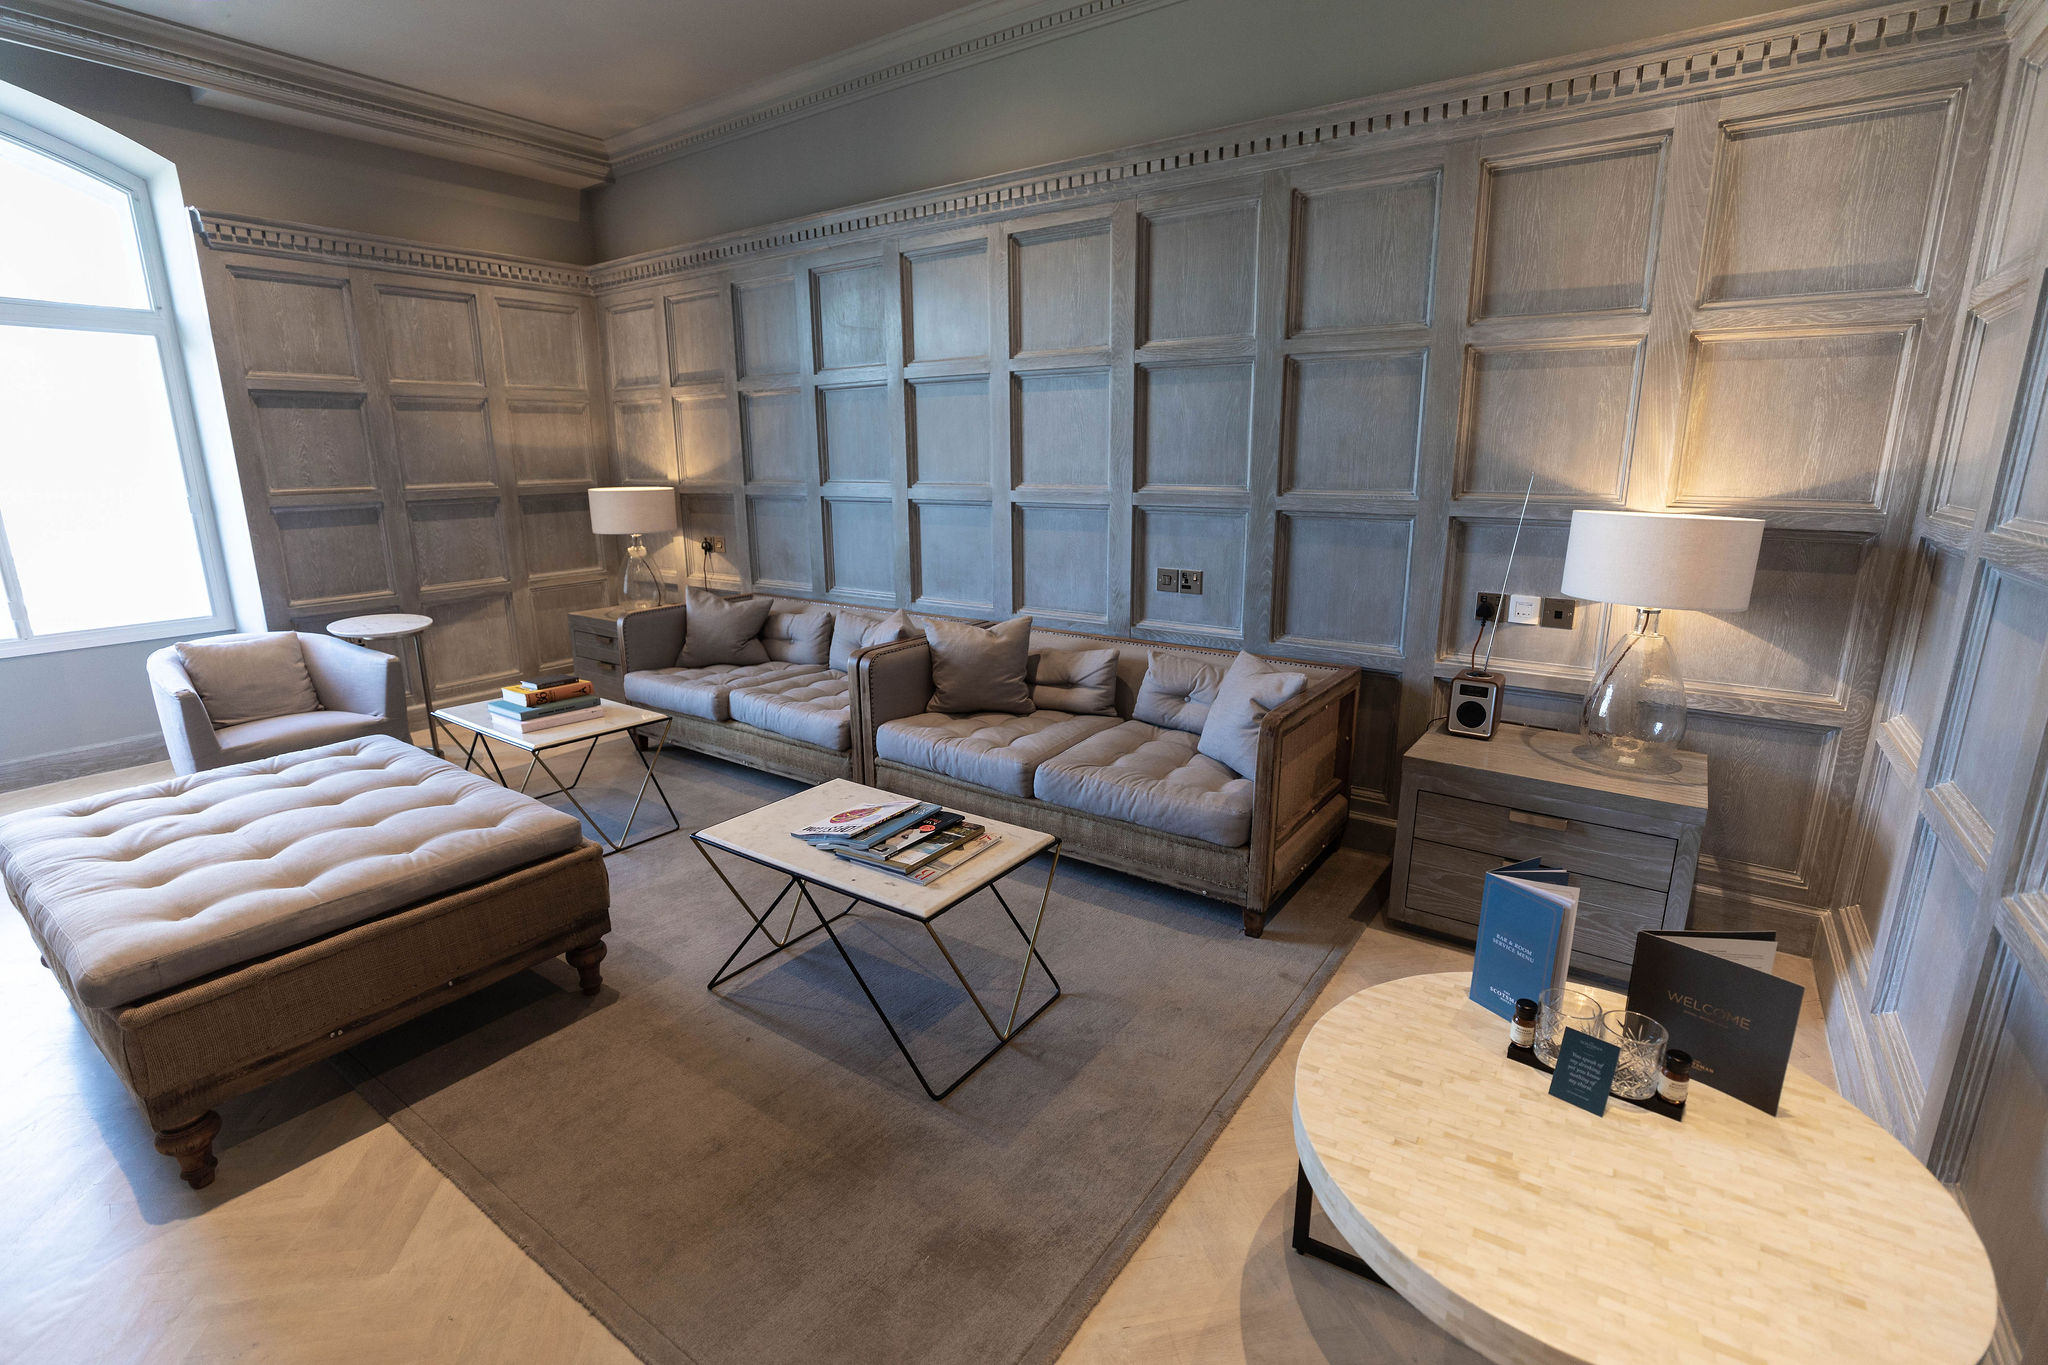 Sitting Room Photos of the Headline Suite at The Scotsman Hotel in Edinburgh, Scotland